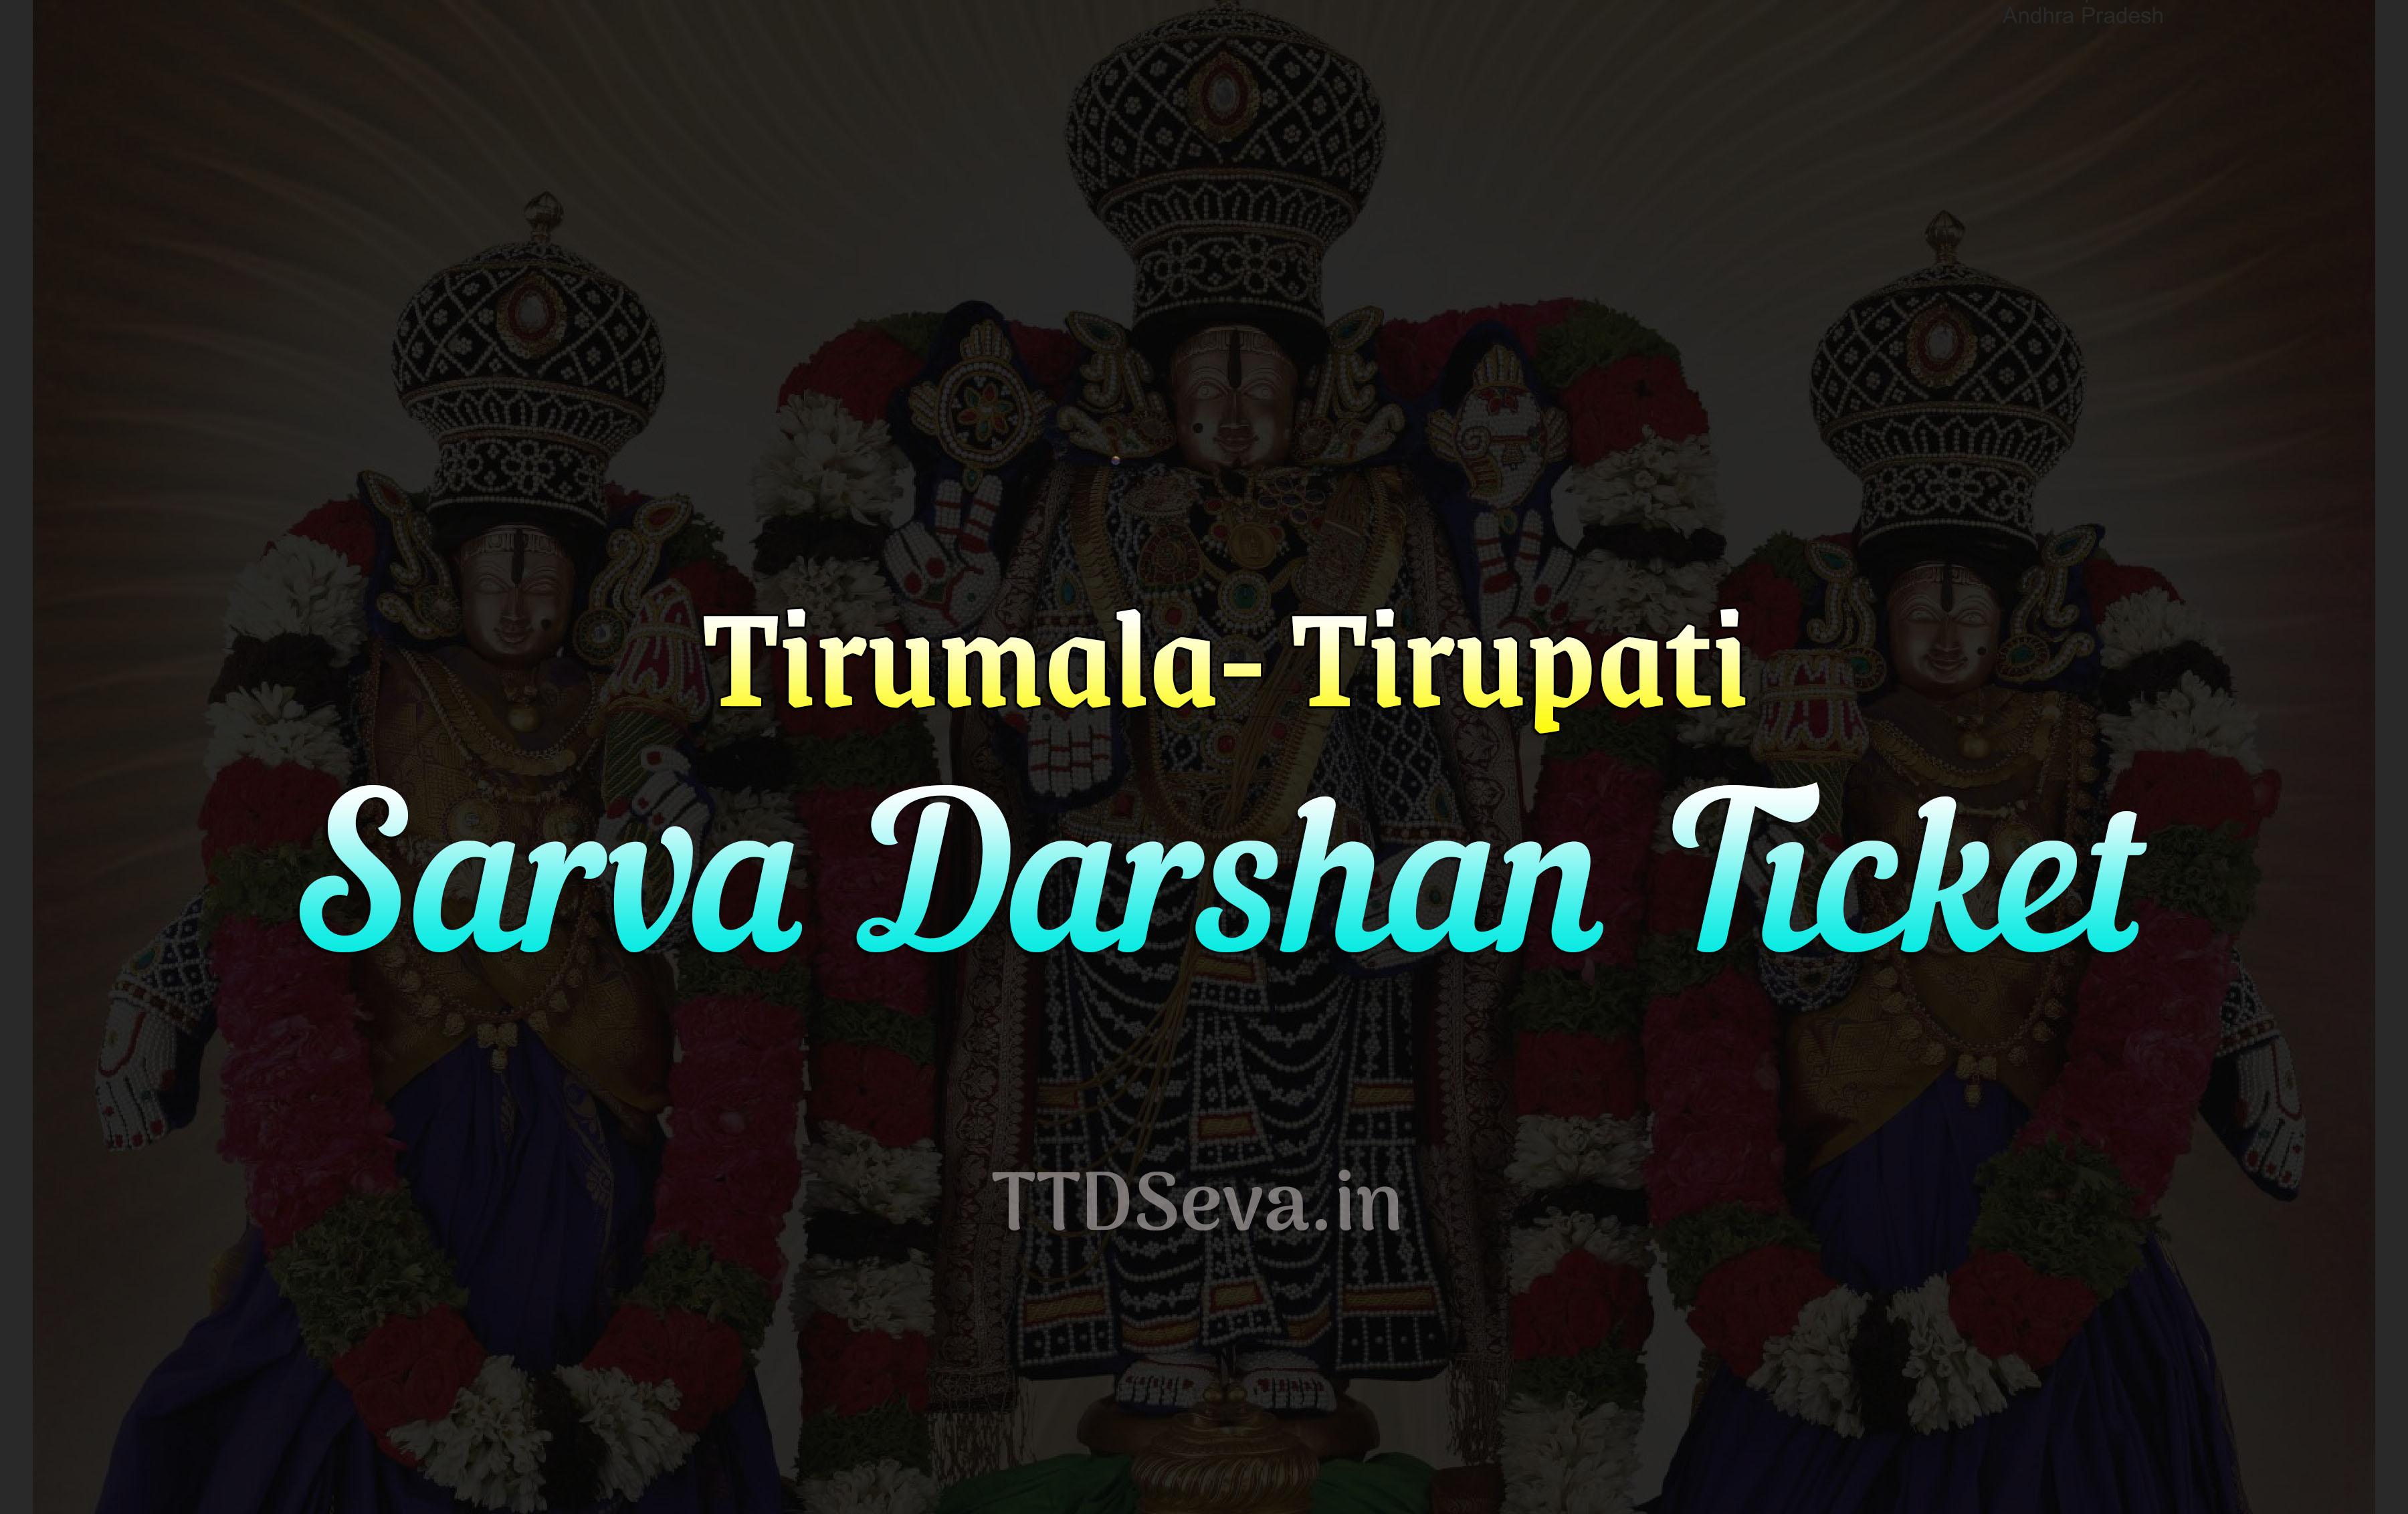 Sarva darshan